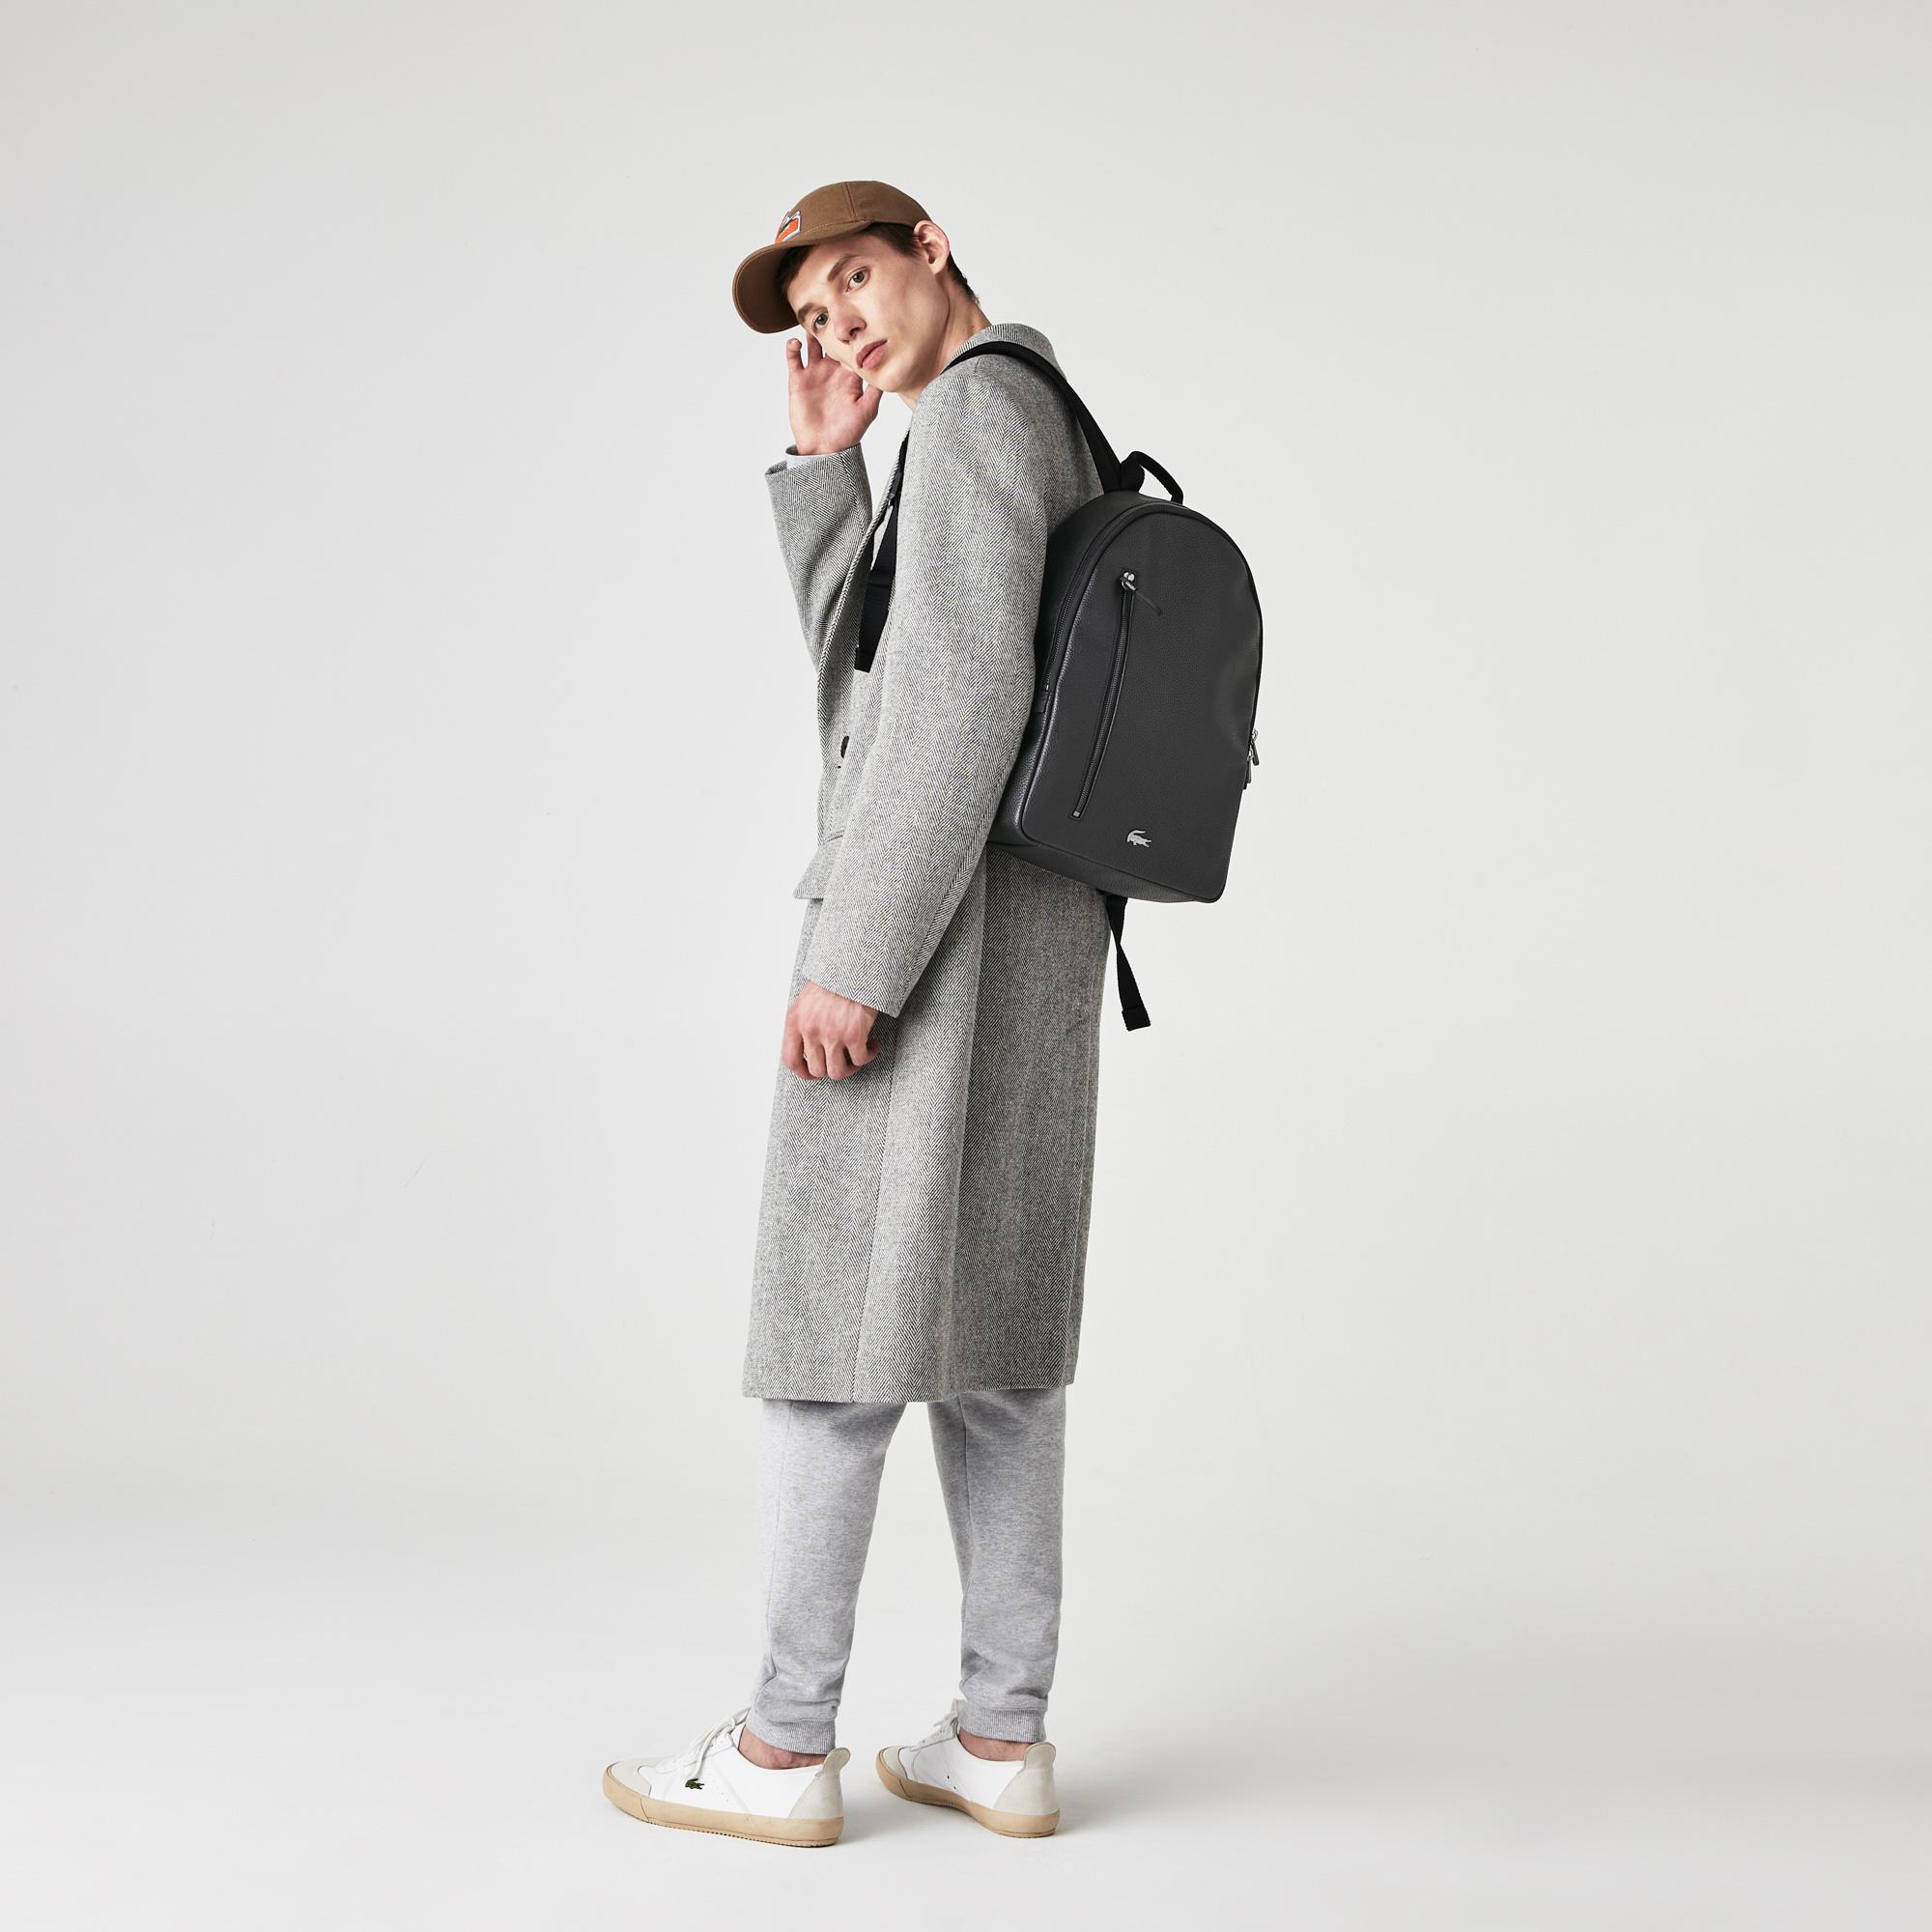 Lacoste Men's Soft Mate Matte Full-Grain Leather Flat Backpack